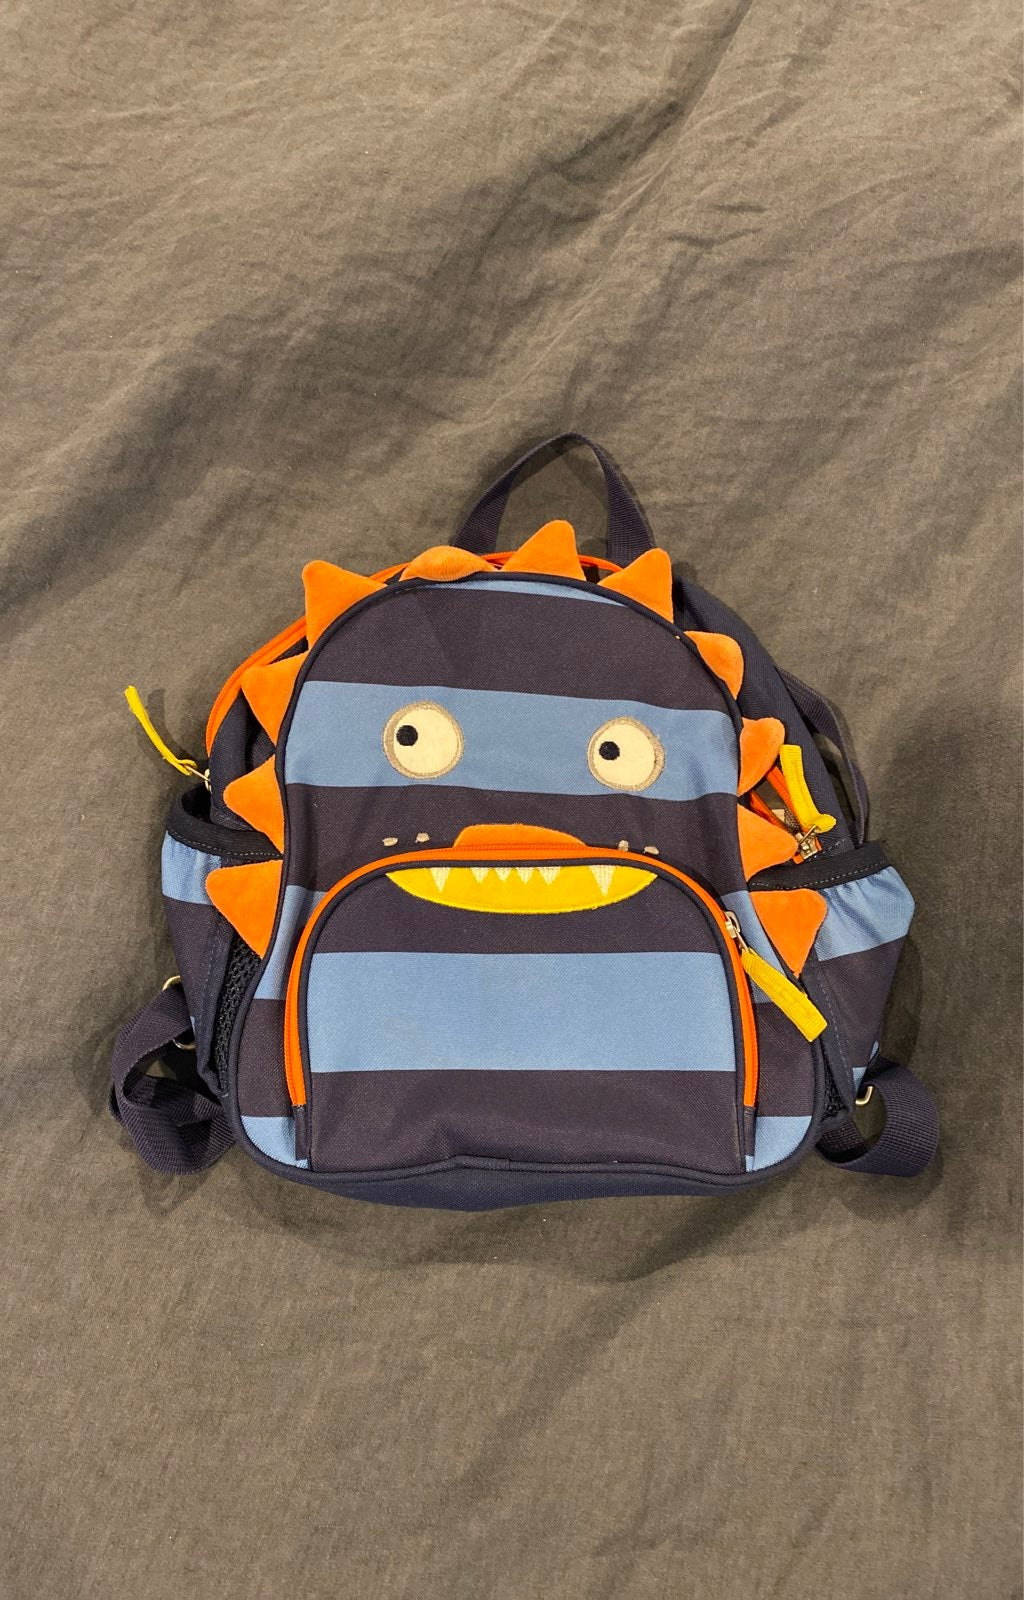 Pottery Barn Kids Backpack